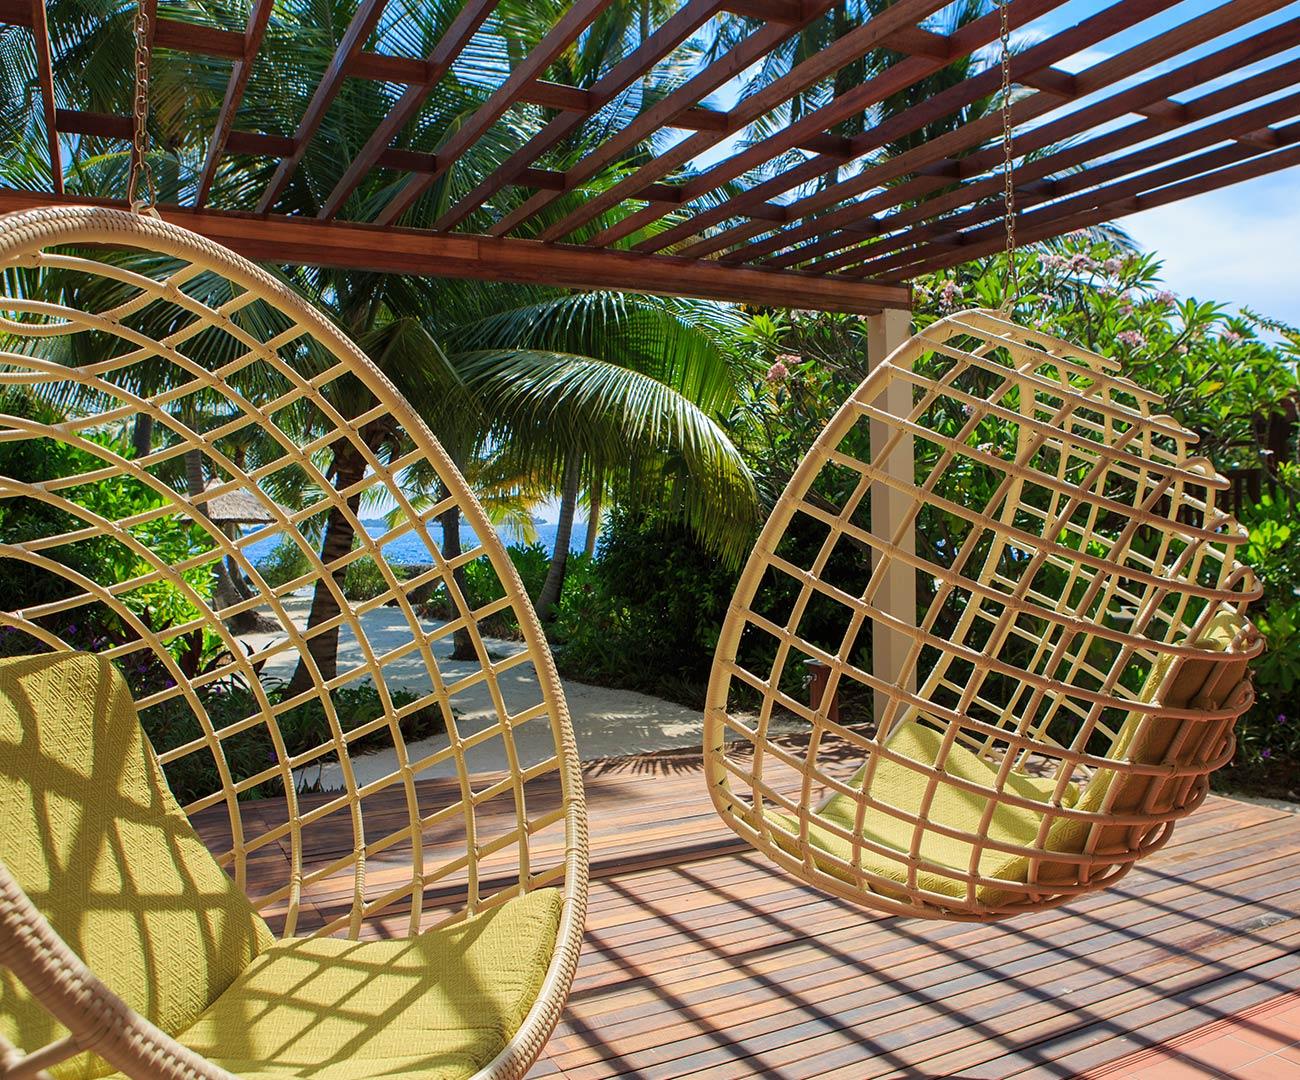 Kurumba Maldives - Presidential Pool Villa - Balcony Image - Maldives Resorts